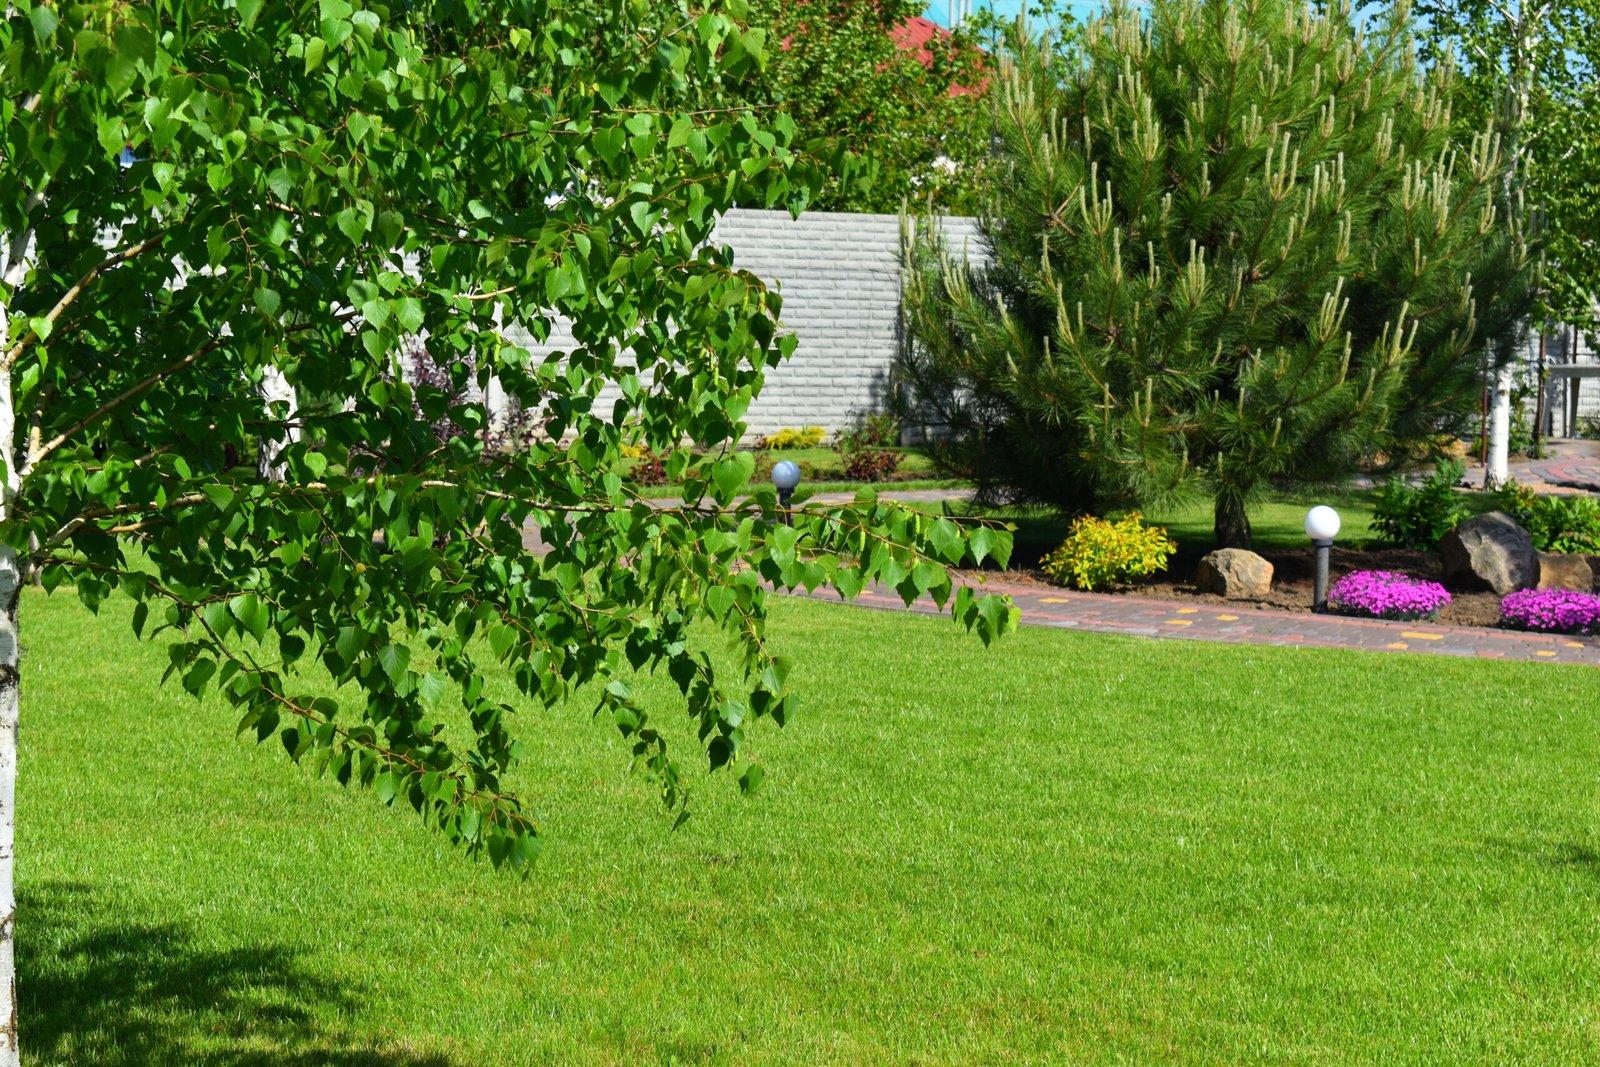 стрижка газона, питание газона, стойкий газон